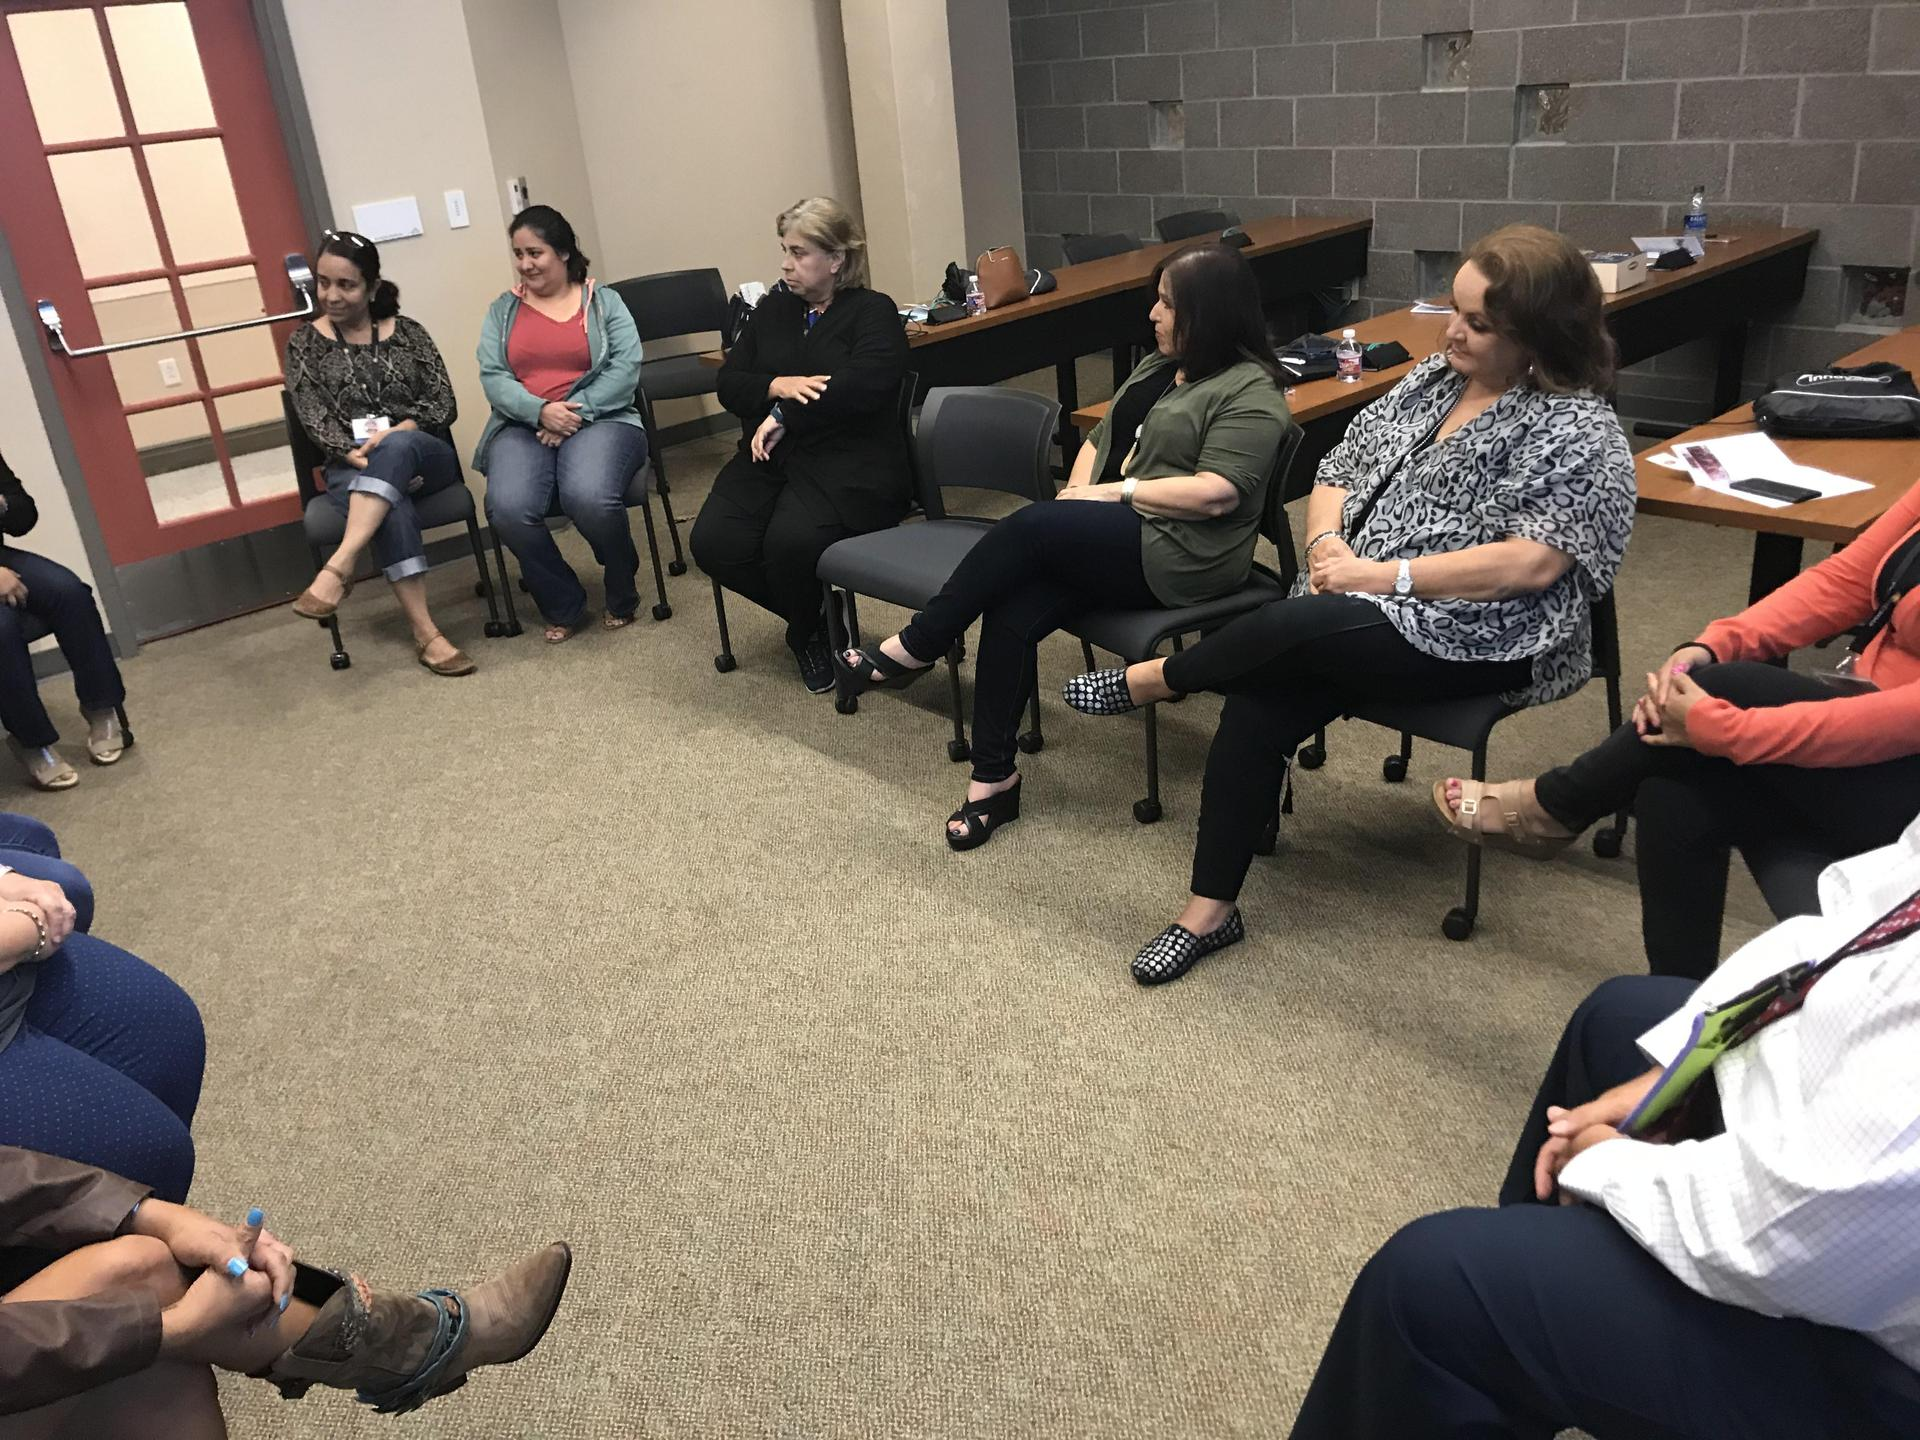 Teachers sitting down listening to the presenter